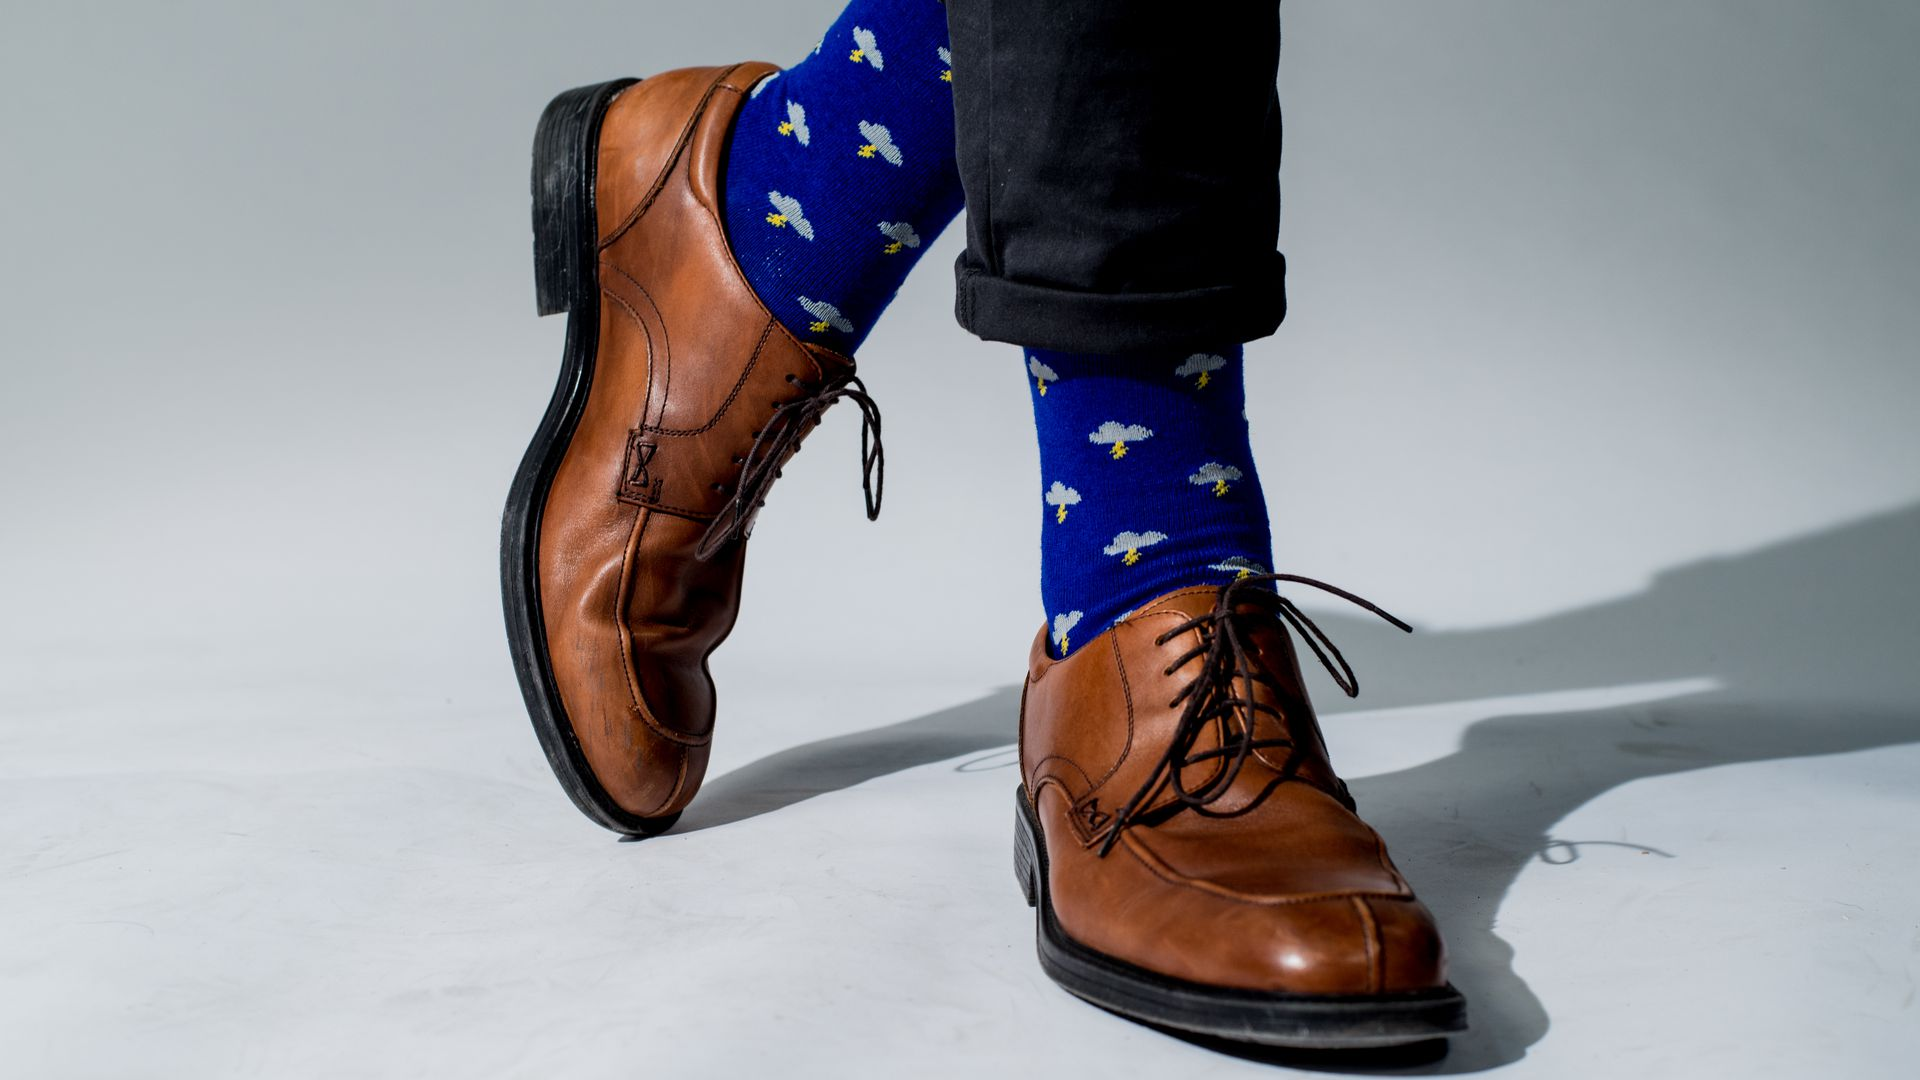 35cf6231ddd The charity and politics of flashy socks - Axios